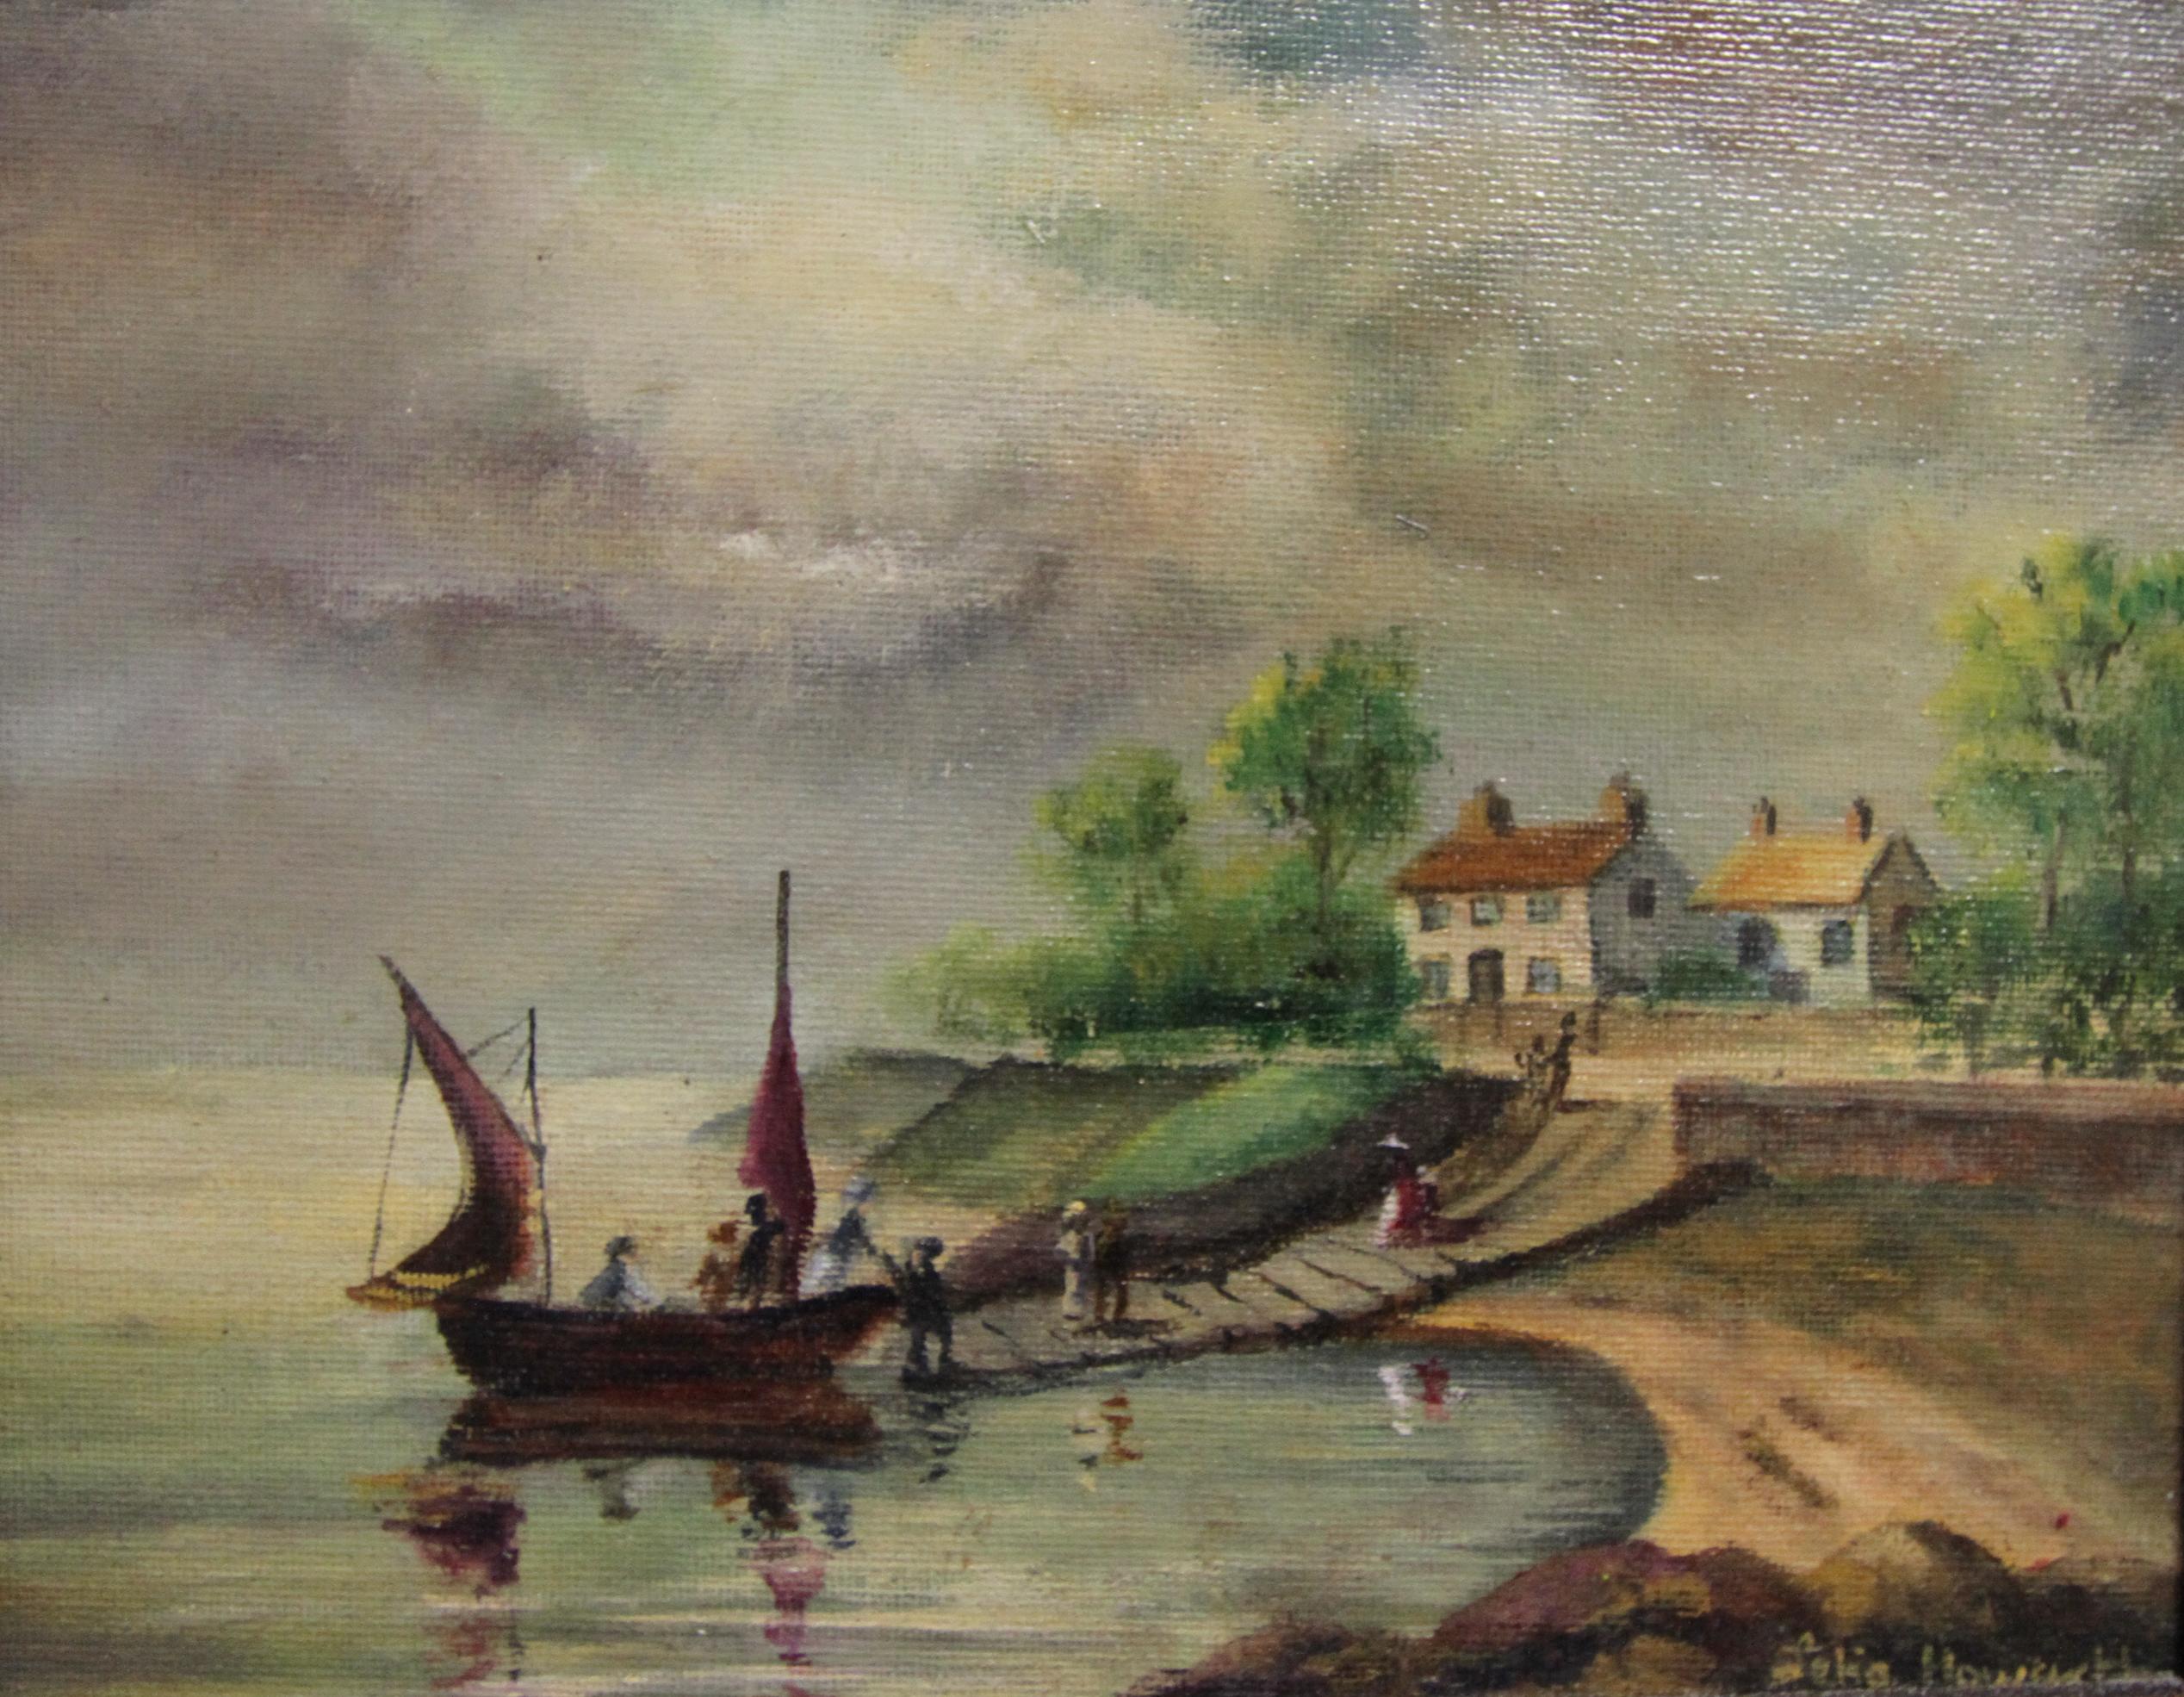 Woodside Ferry 1814 (after Herdsman)